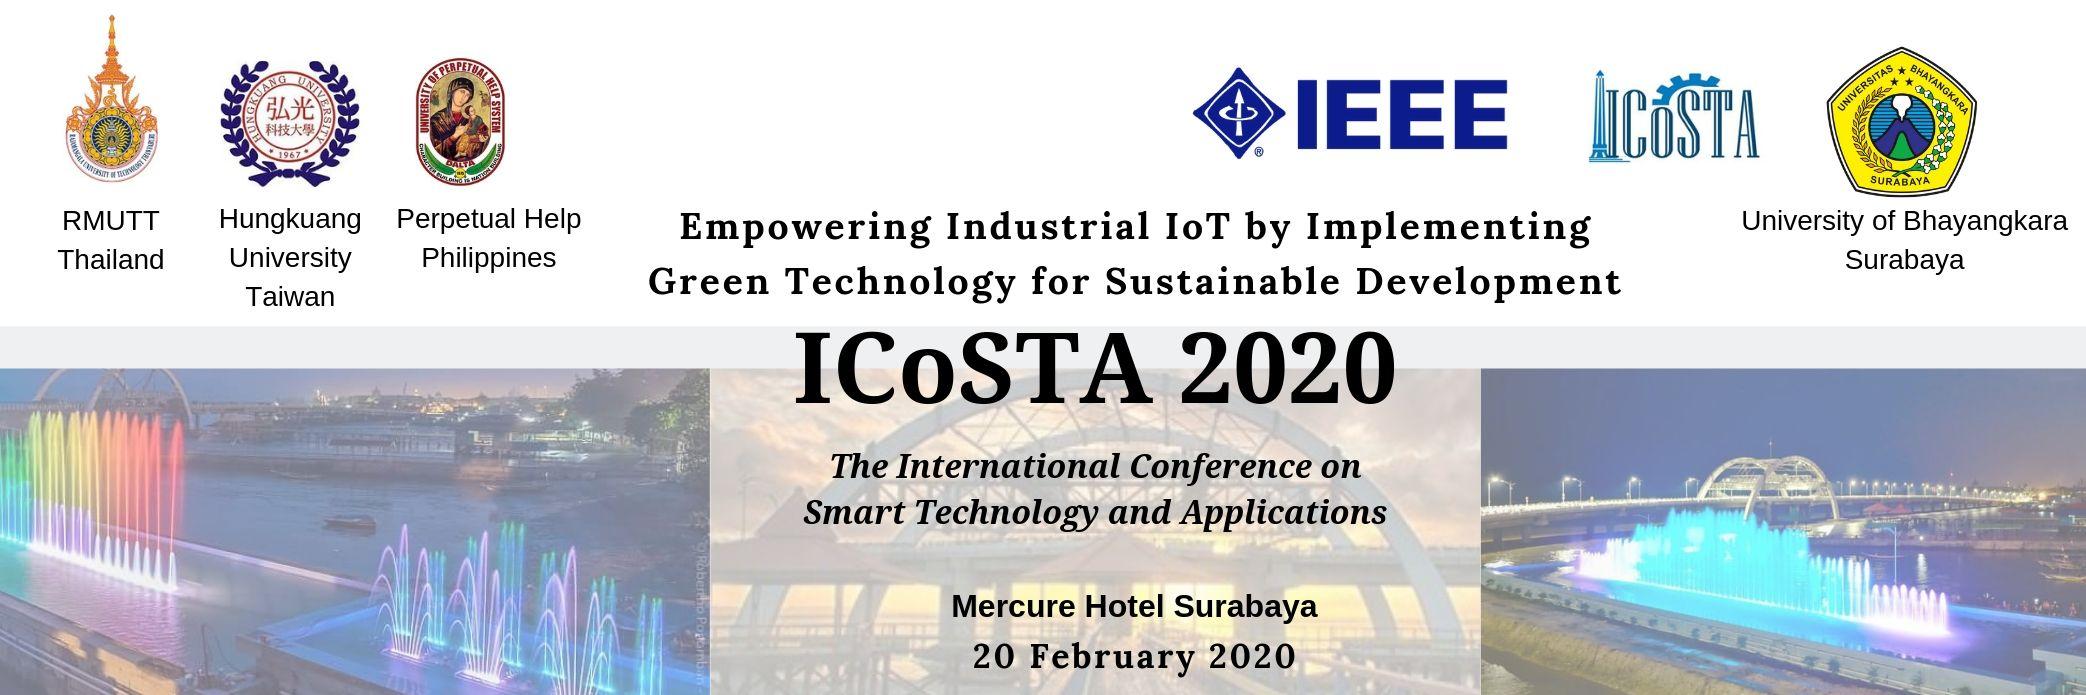 ICoSTA 2020